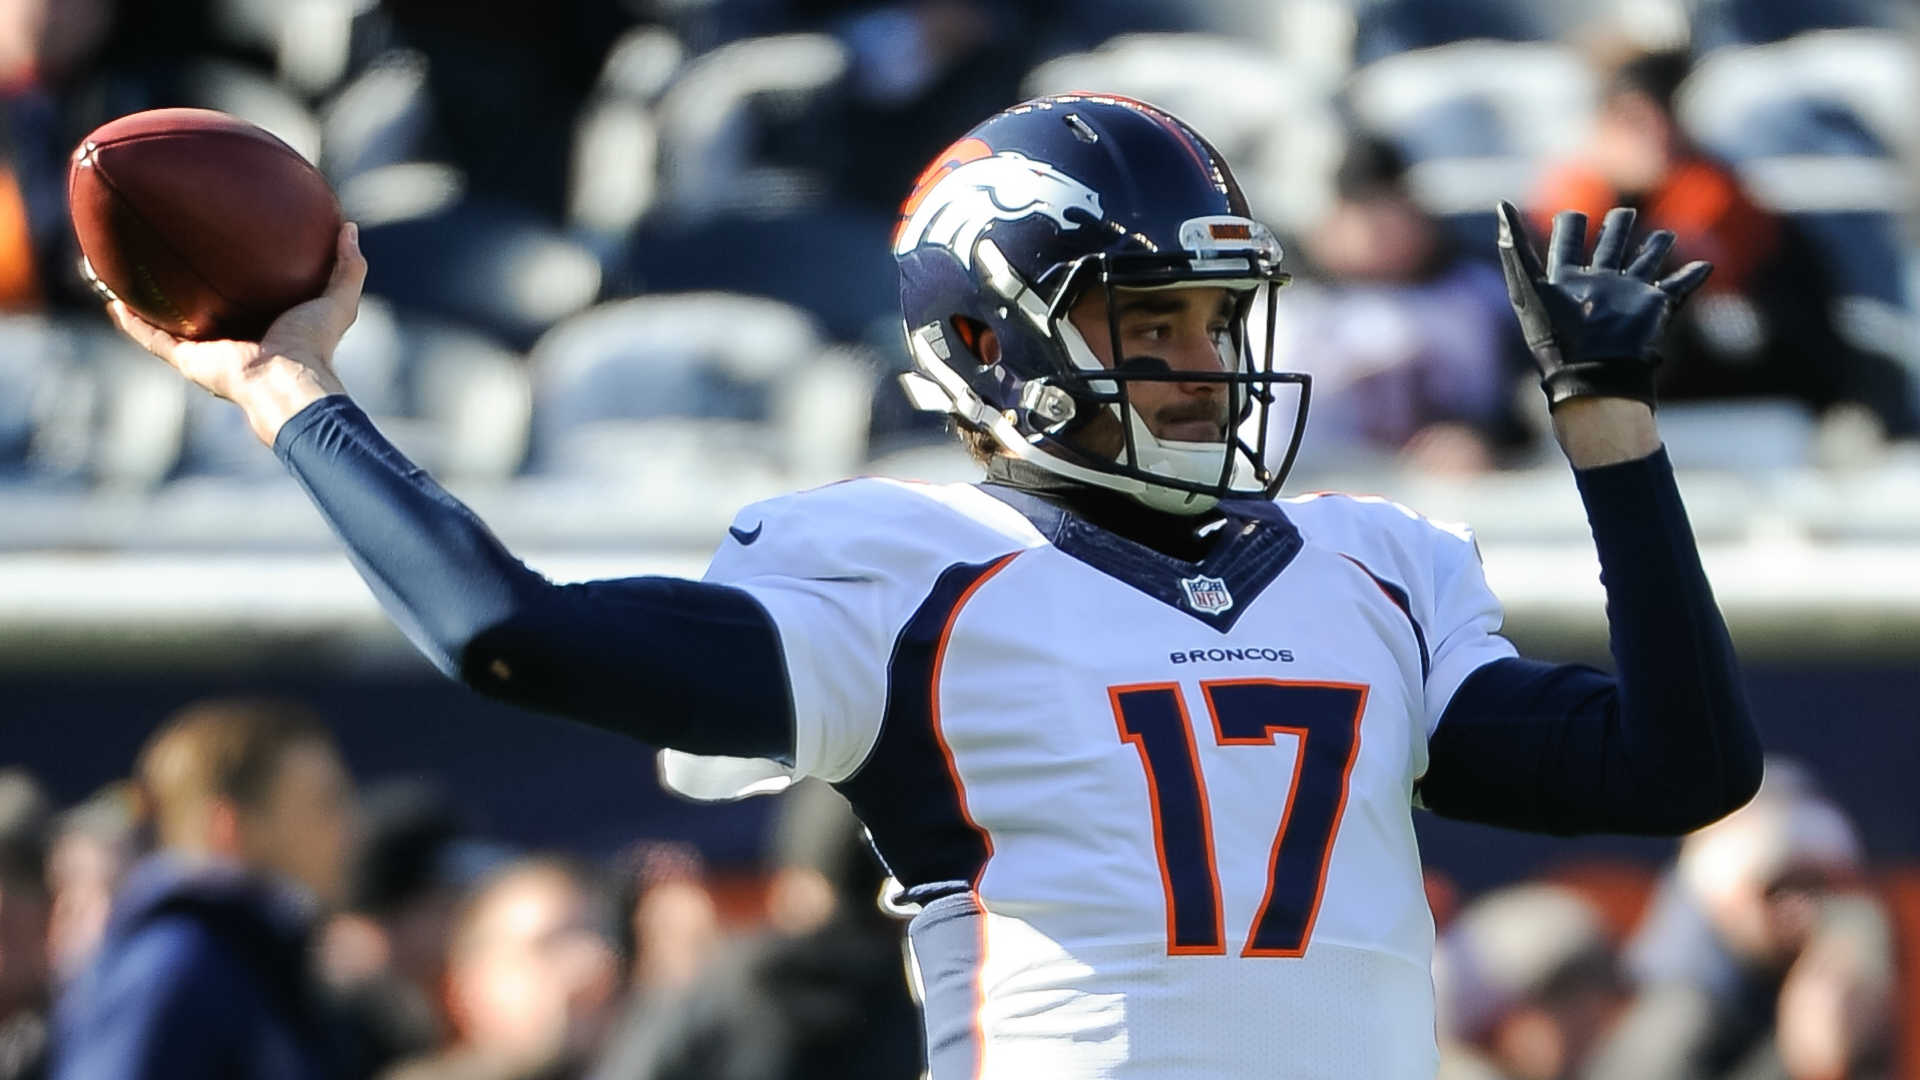 Broncos clinch playoff spot